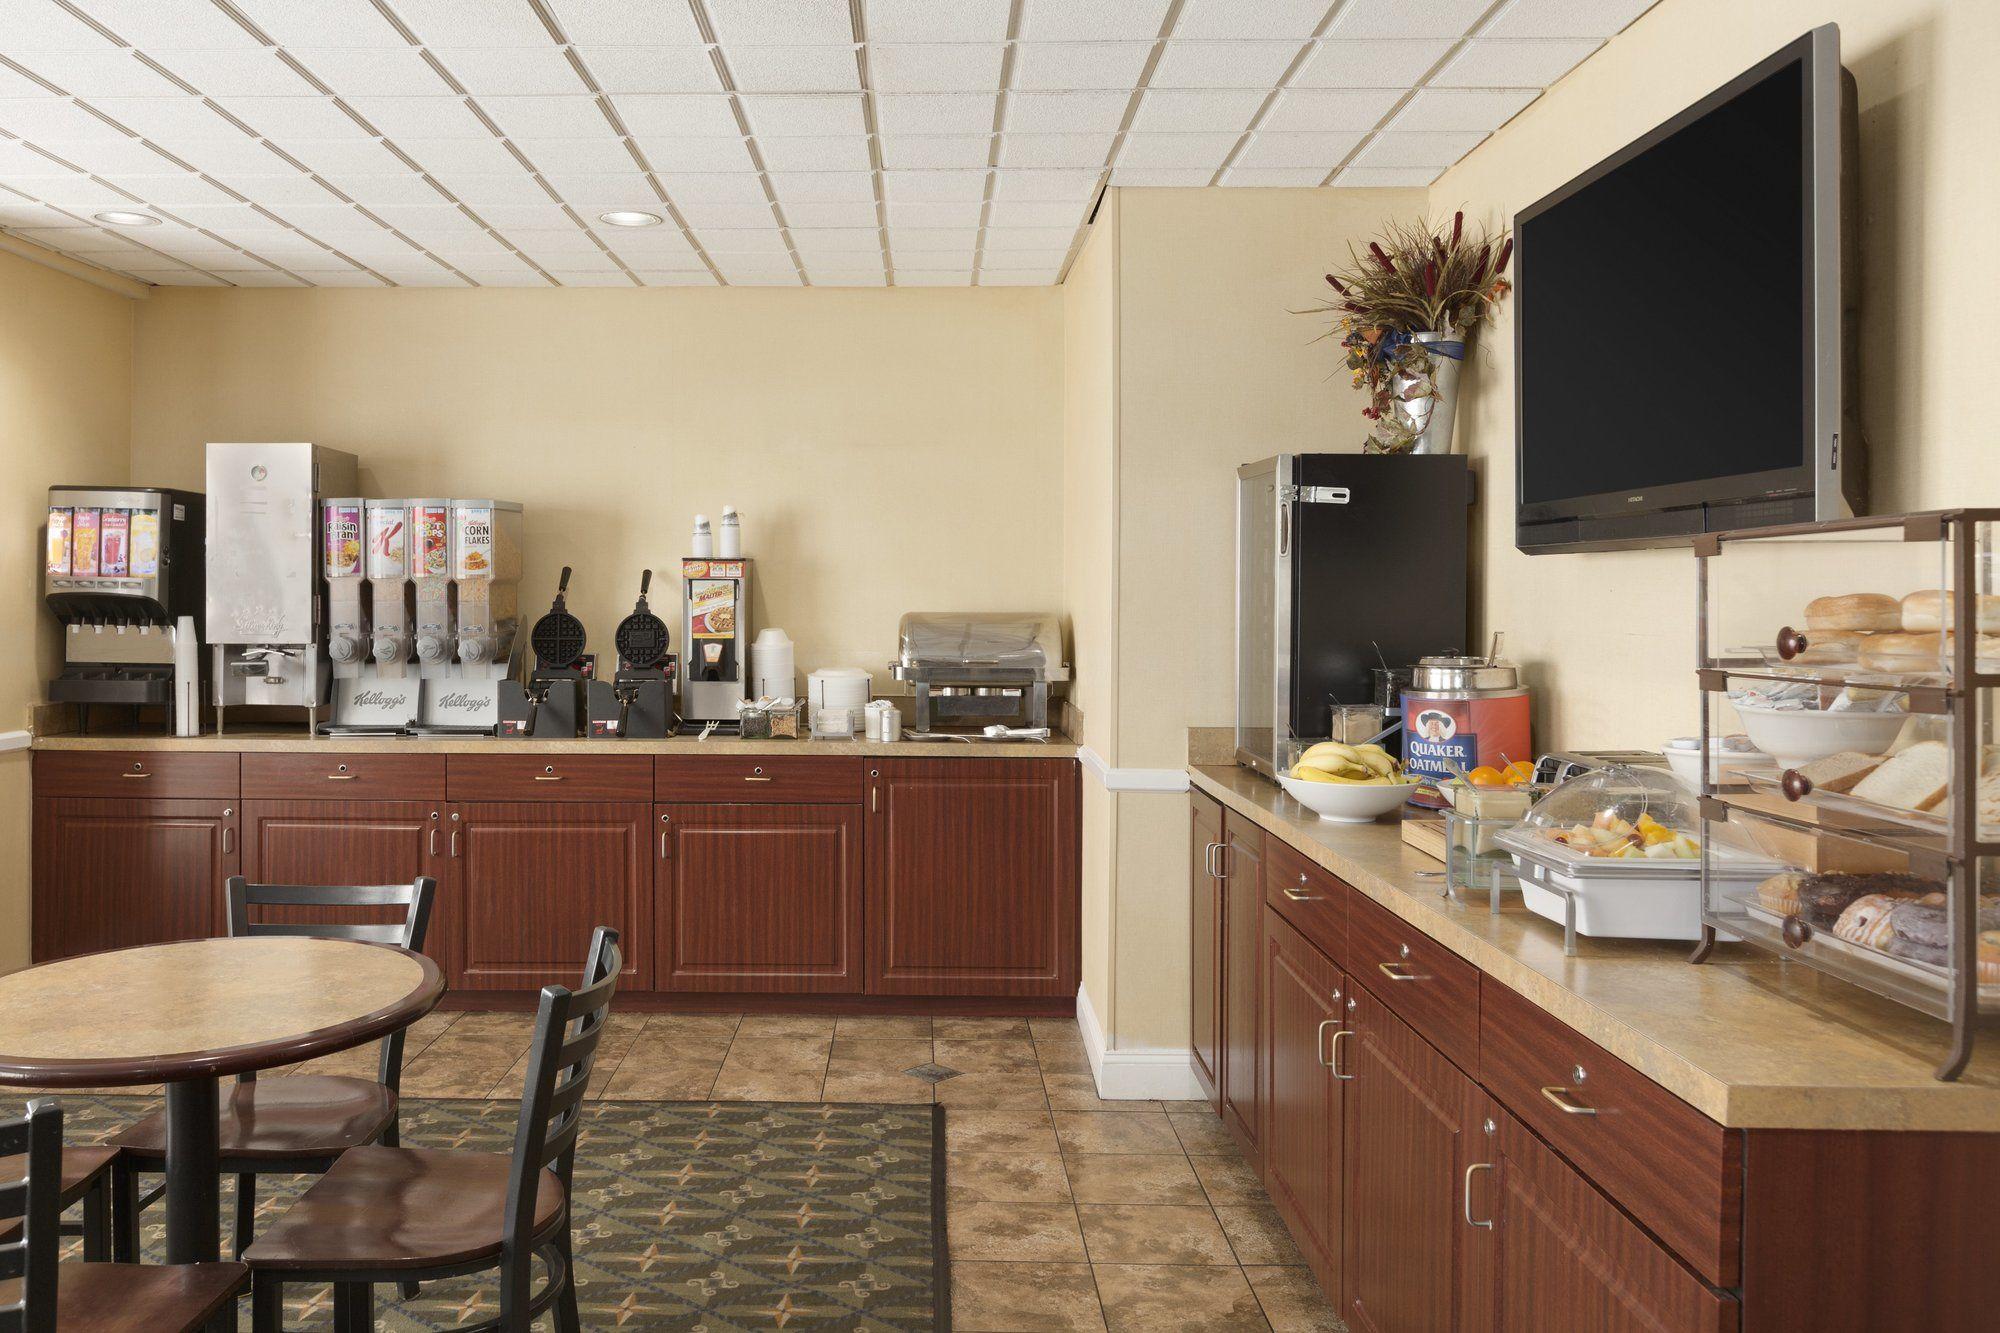 Country Inn & Suites in Fredericksburg, VA